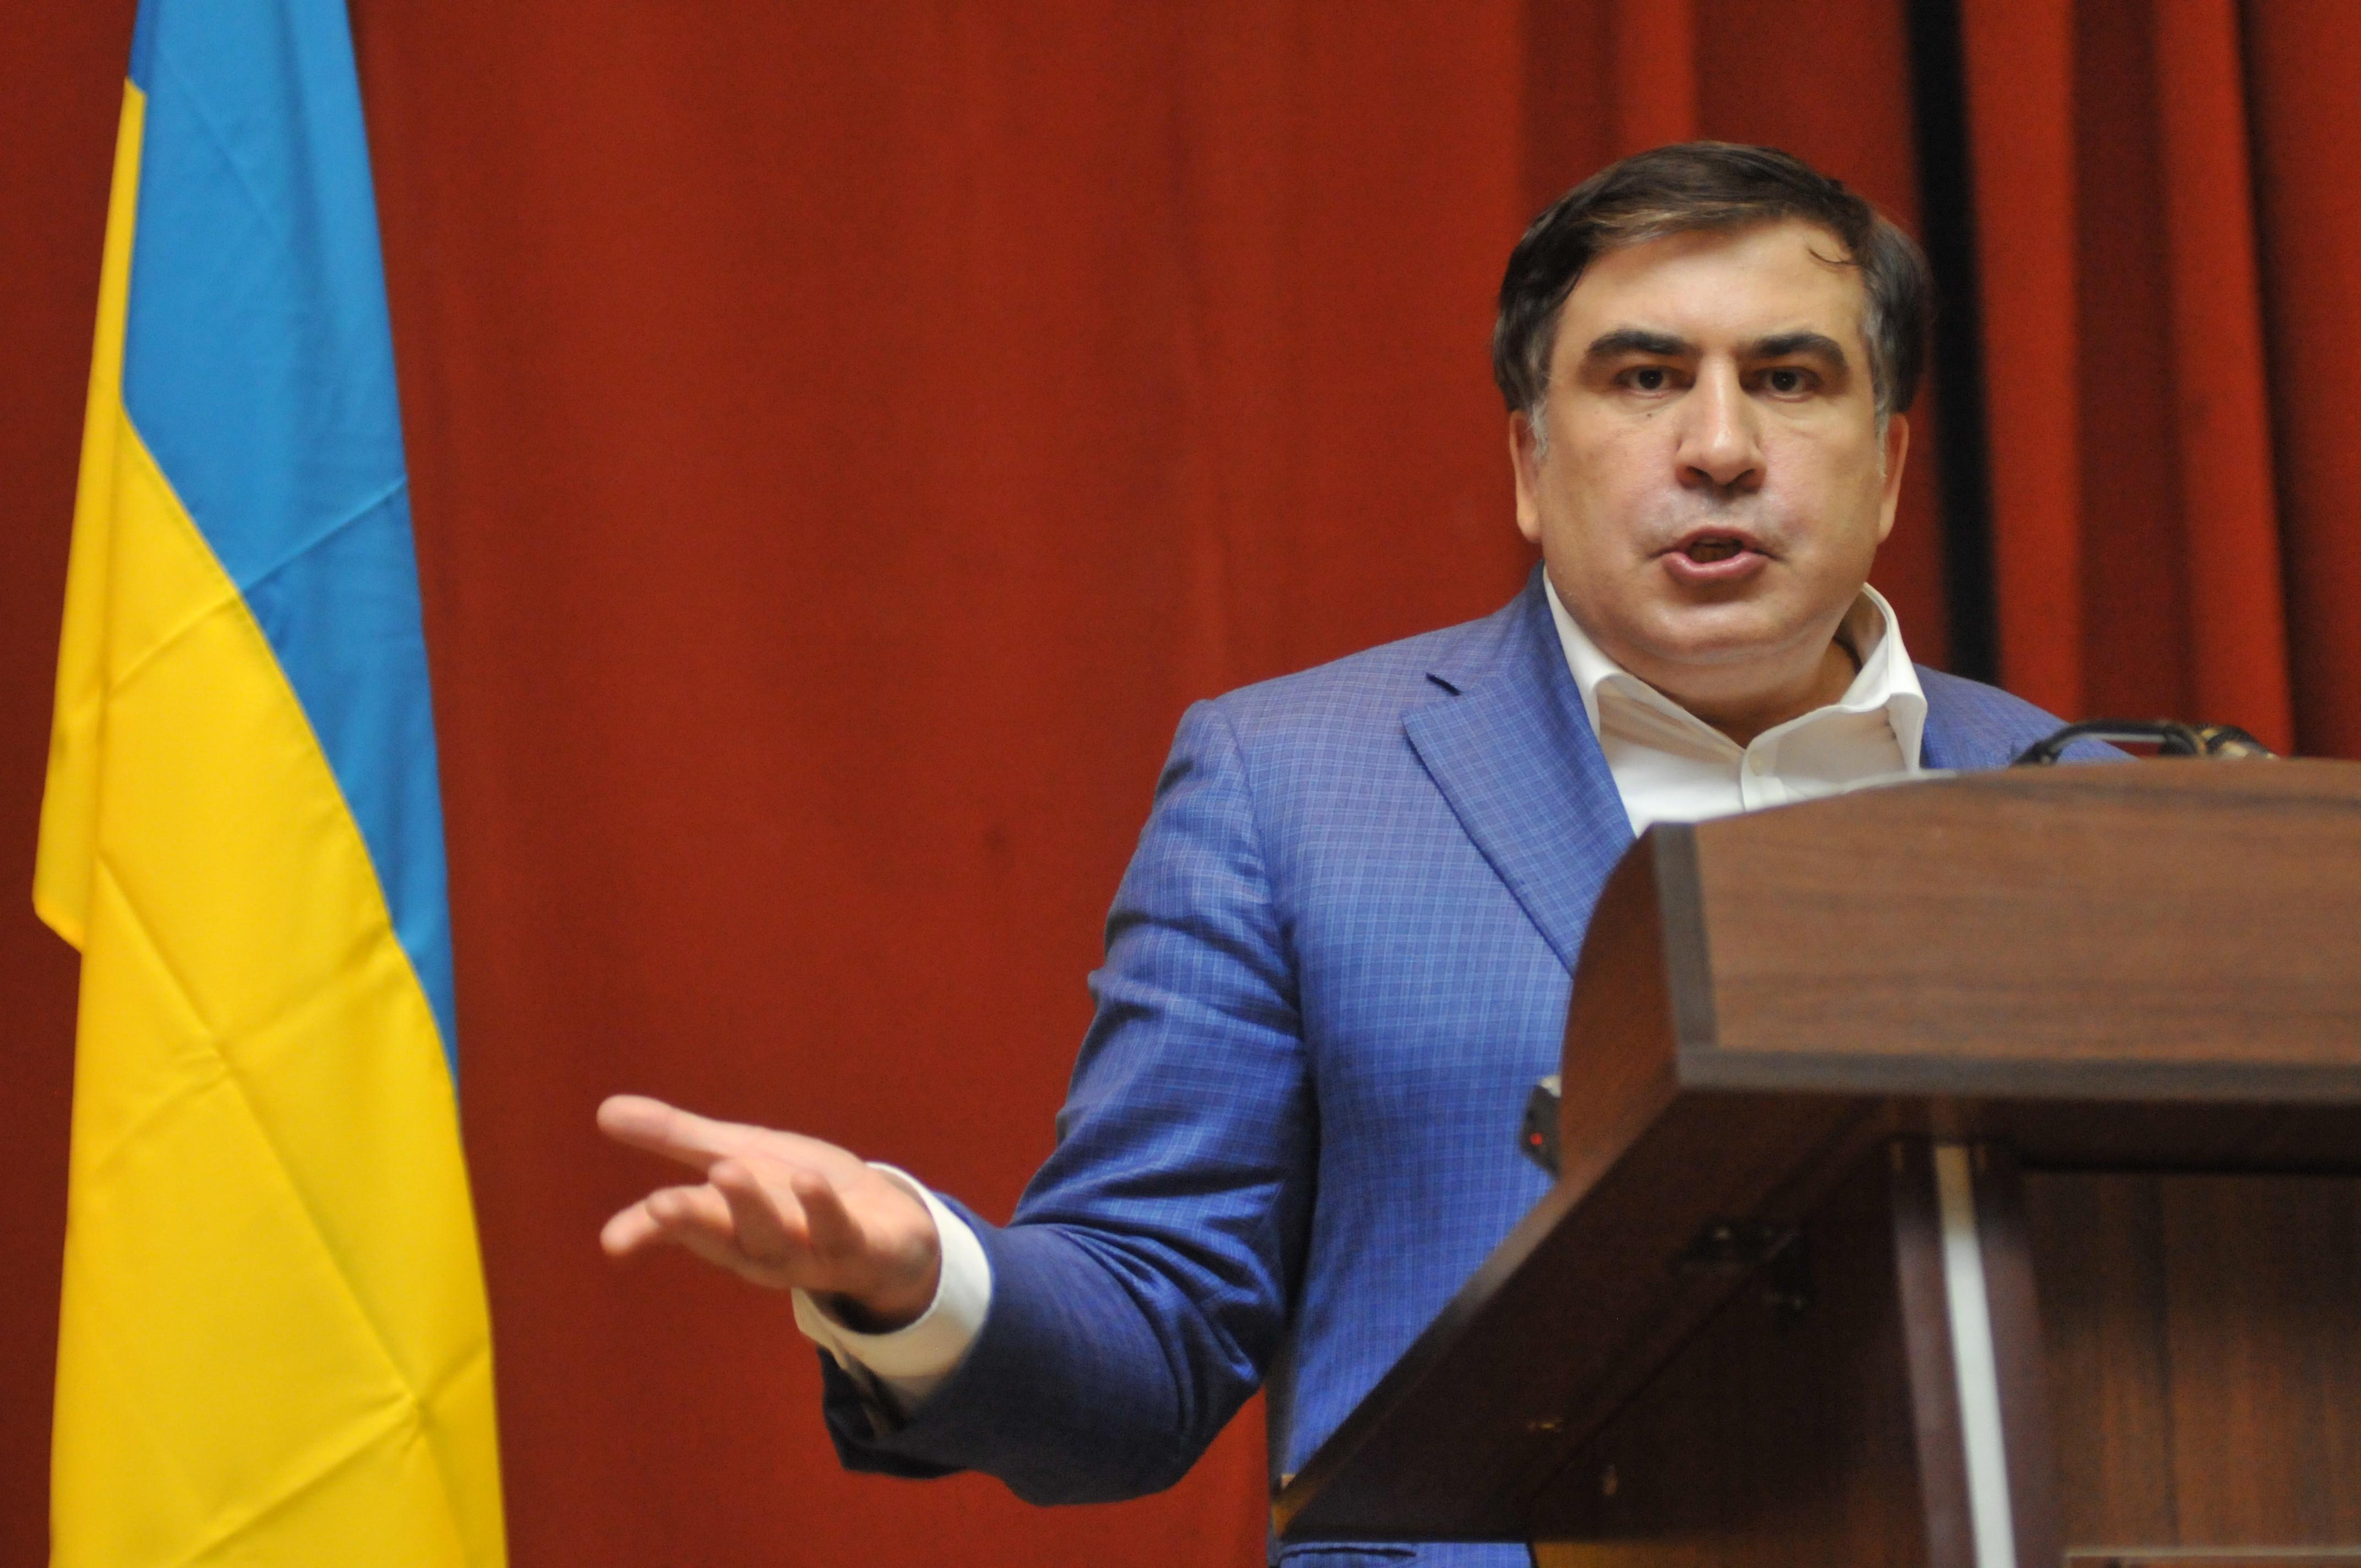 <p>Михаил Саакашвили. Фото: &copy;РИА Новости</p>